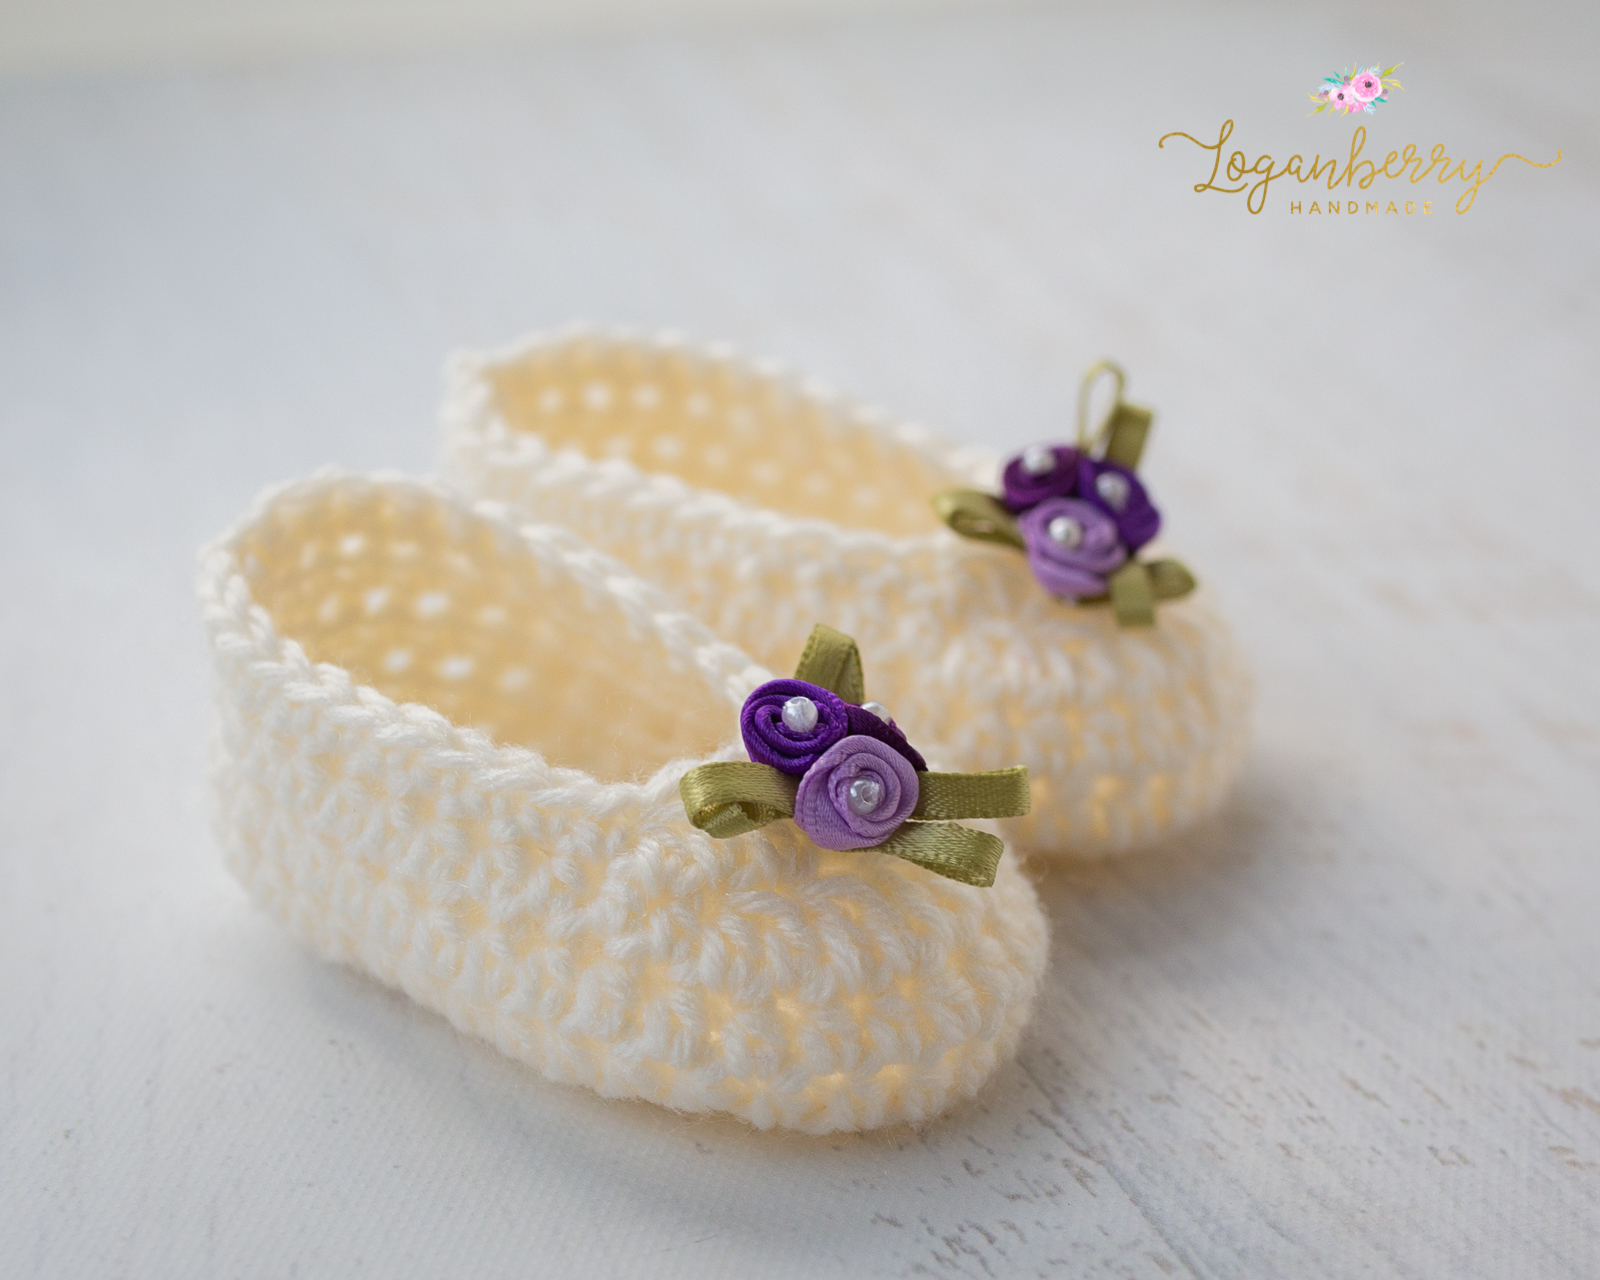 Crochet Simple Baby Slippers Free Pattern Loganberry Handmade